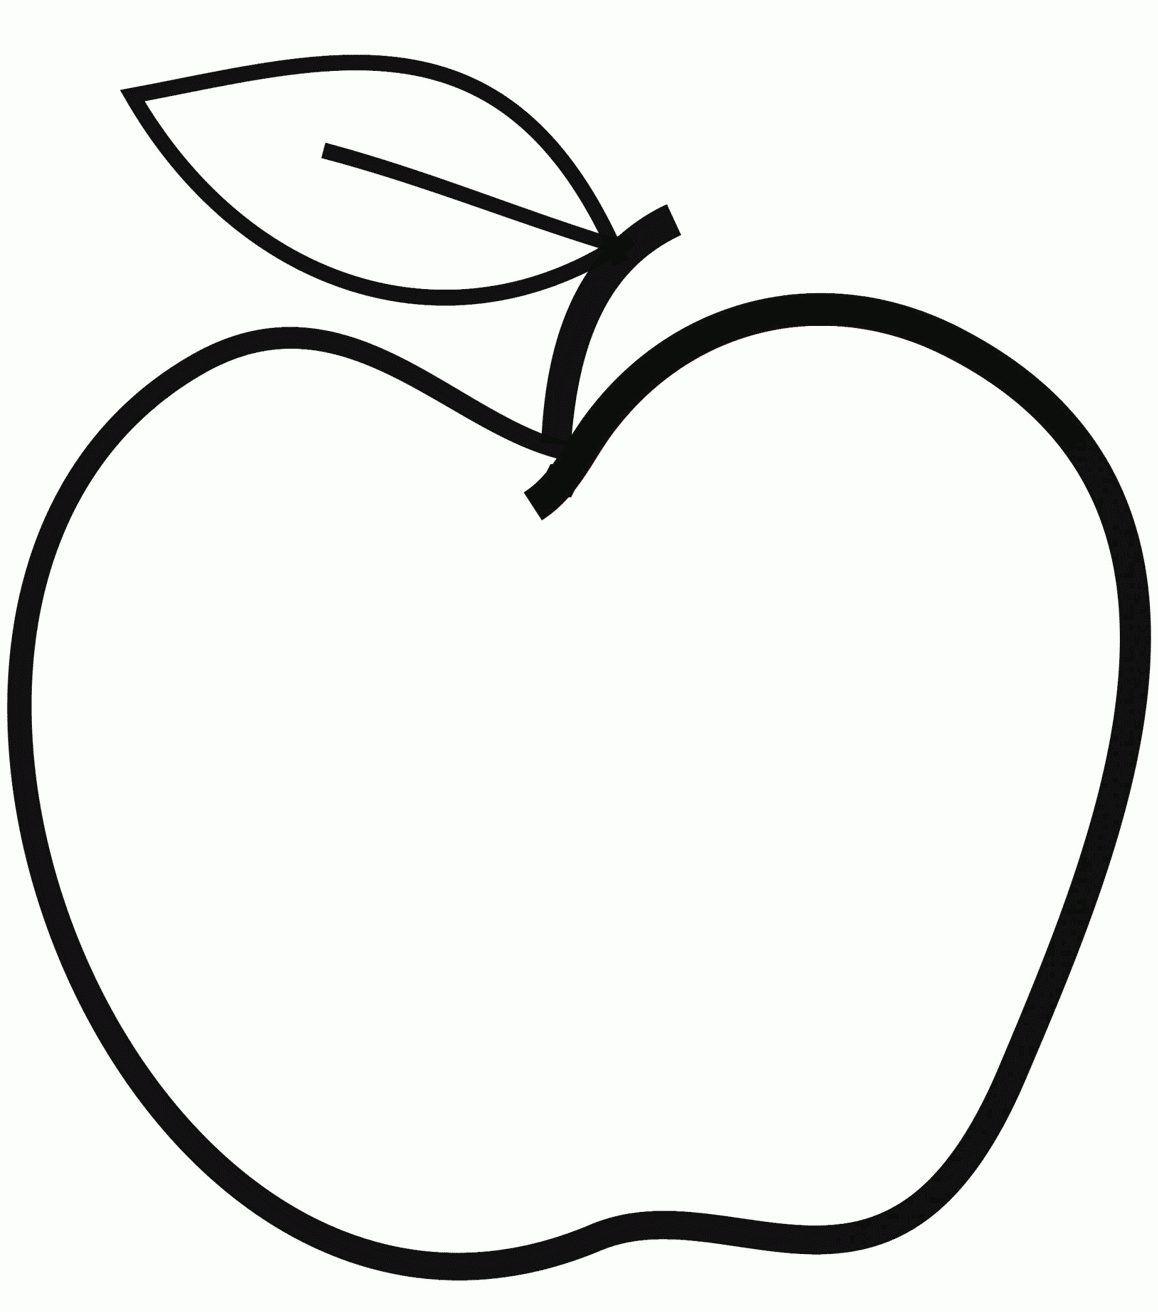 Ausmalbilder Apfel, Vordruck Apfel Schablonen Zum Ausdrucken verwandt mit Schablonen Ausdrucken Vorlagen